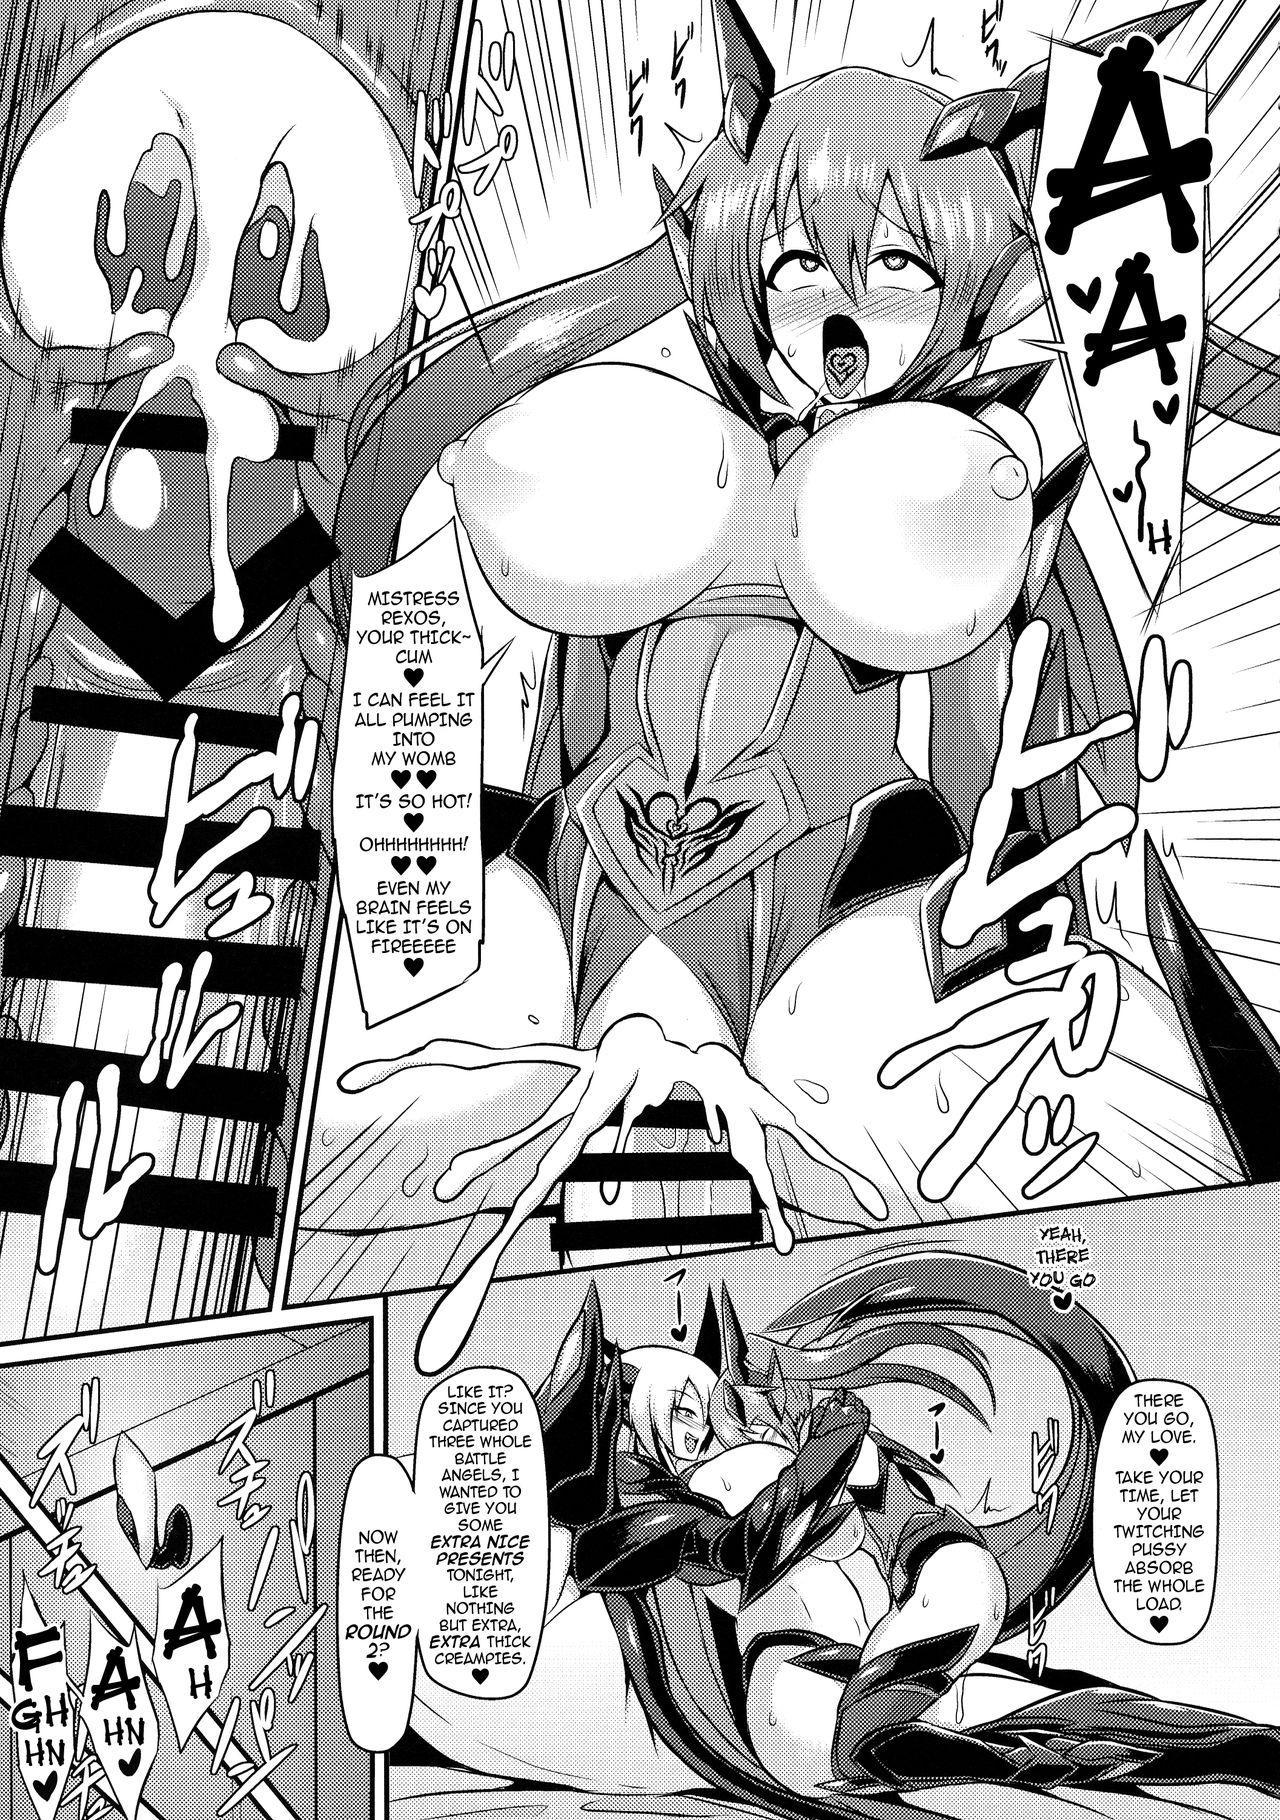 (C94) [Ikameshi Shokudou (Ikameshi)] Seisenki Iris 3 ~Inbinaru Shuuen~ | Battle Angel Iris 3 ~The End of Purity~ [English] {darknight} 10